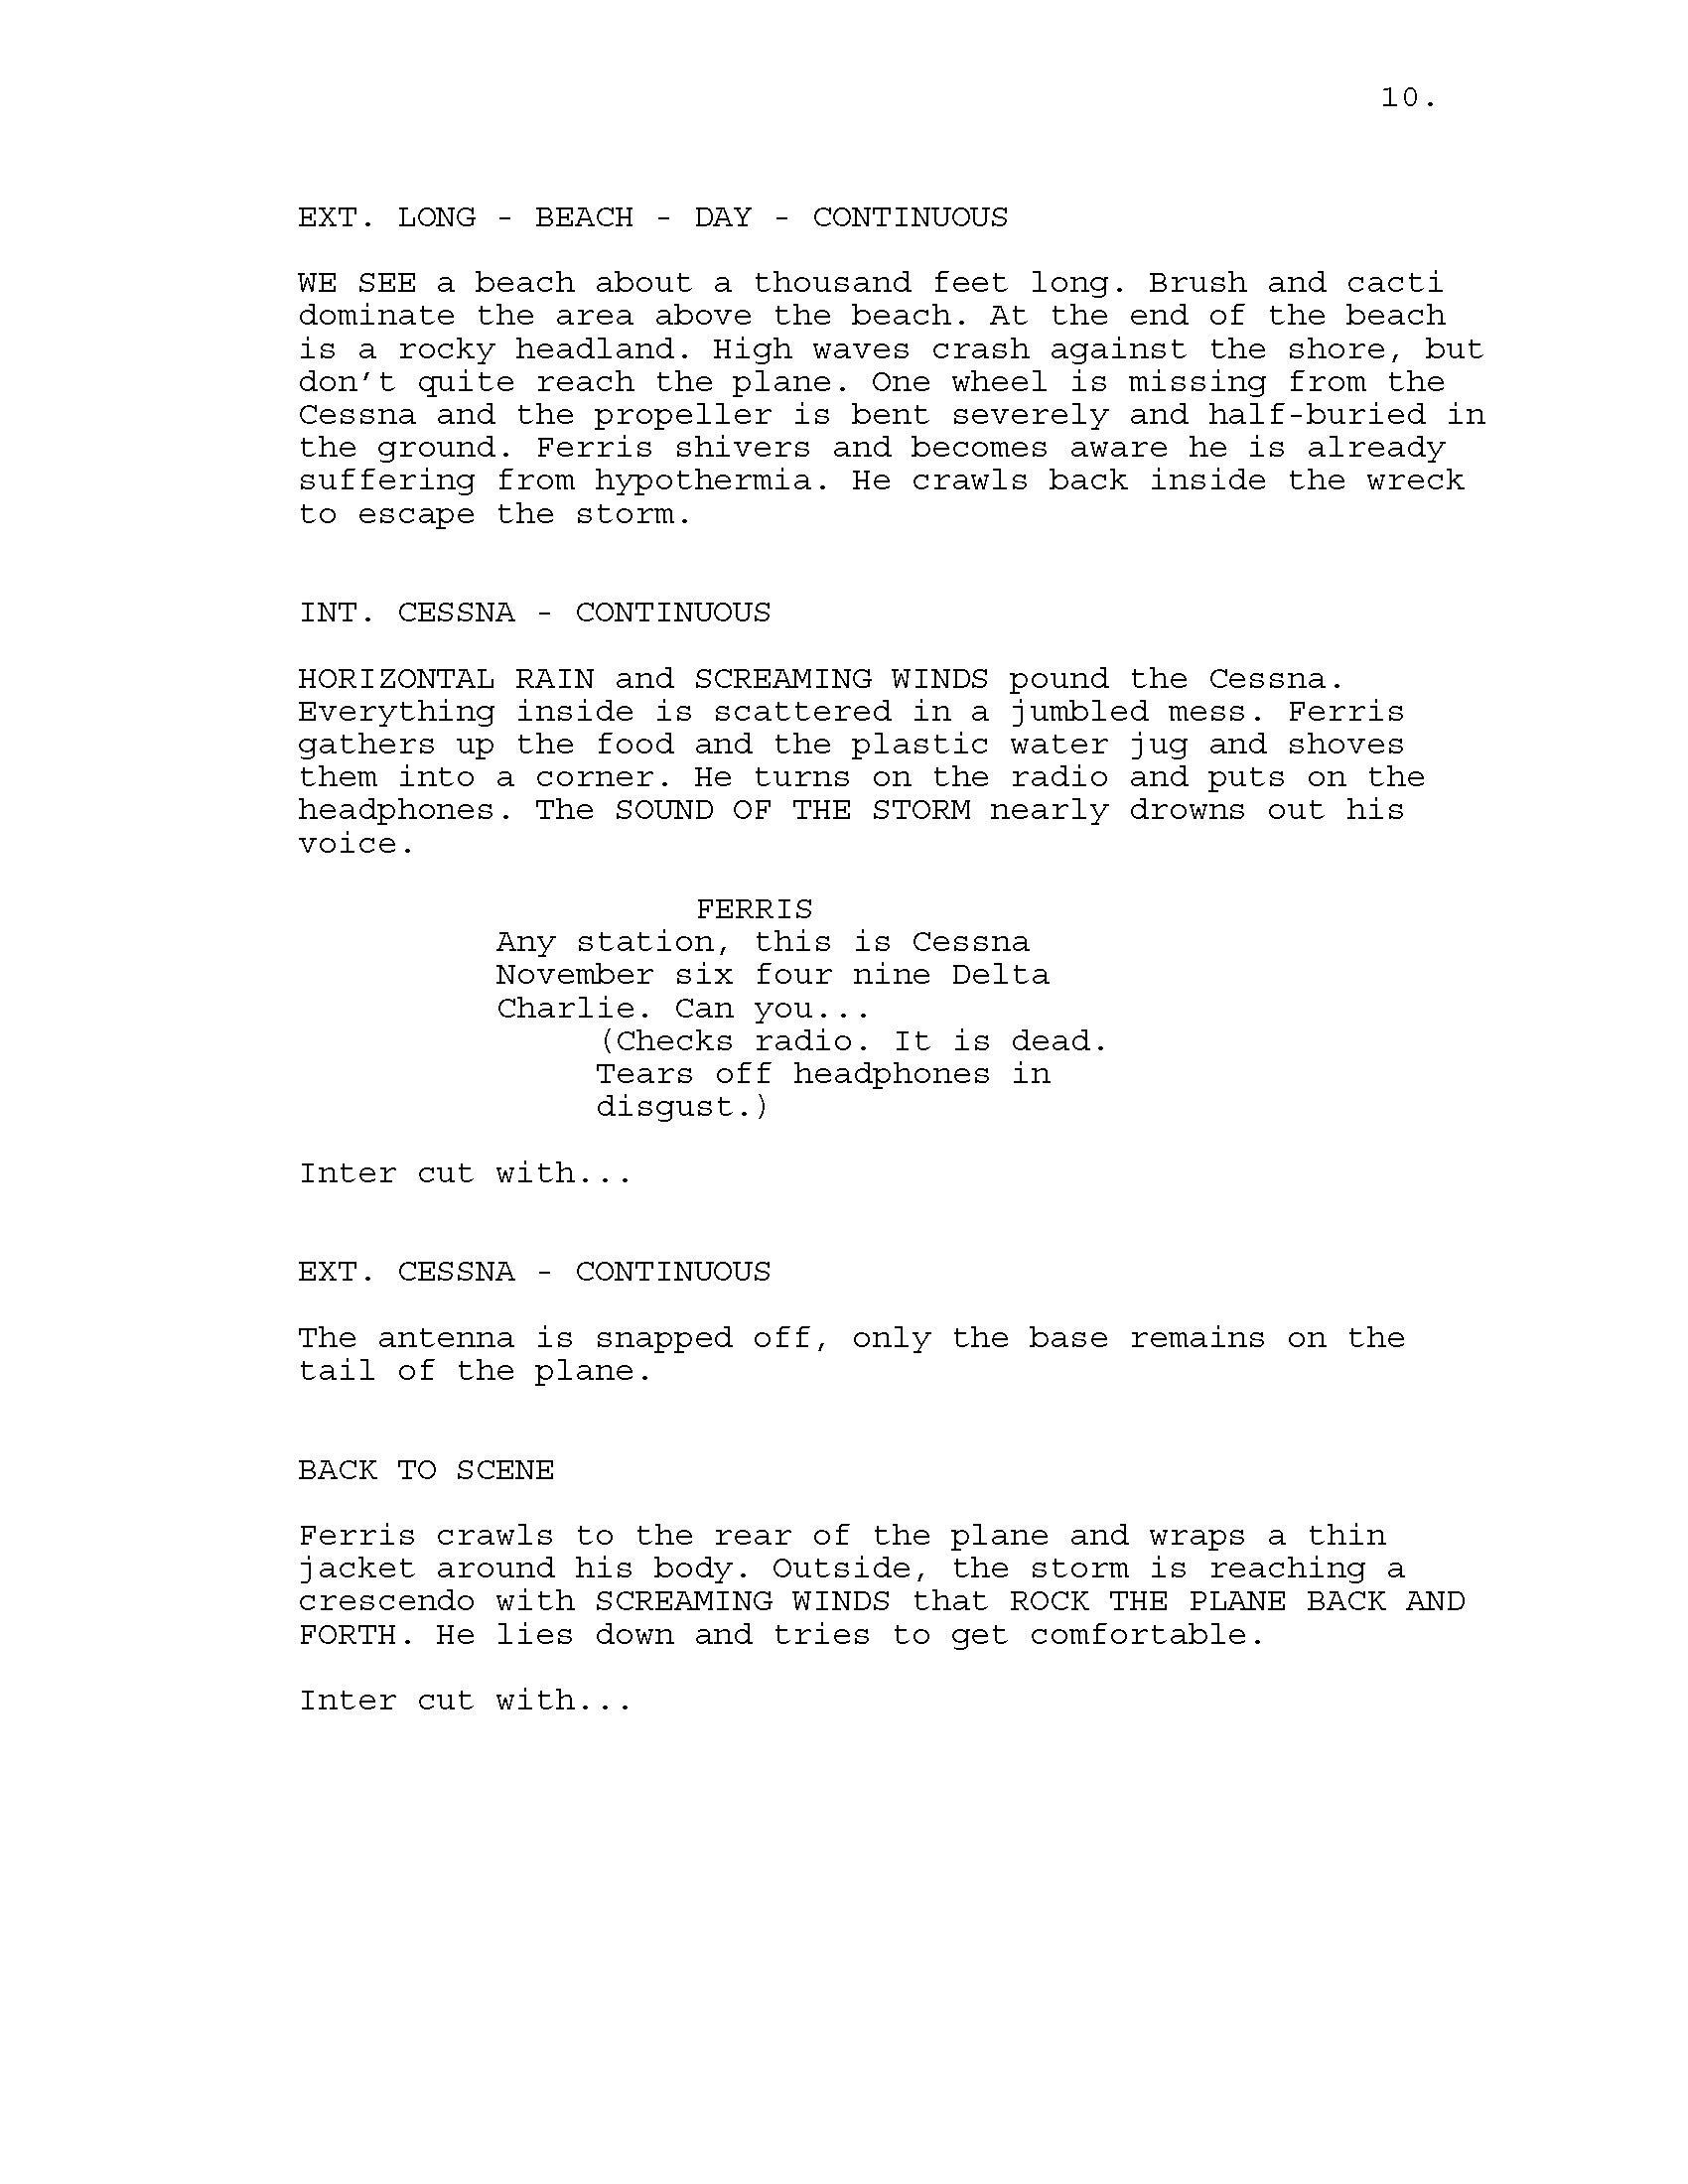 Pilot Down, Presumed Dead_Page_11.jpg